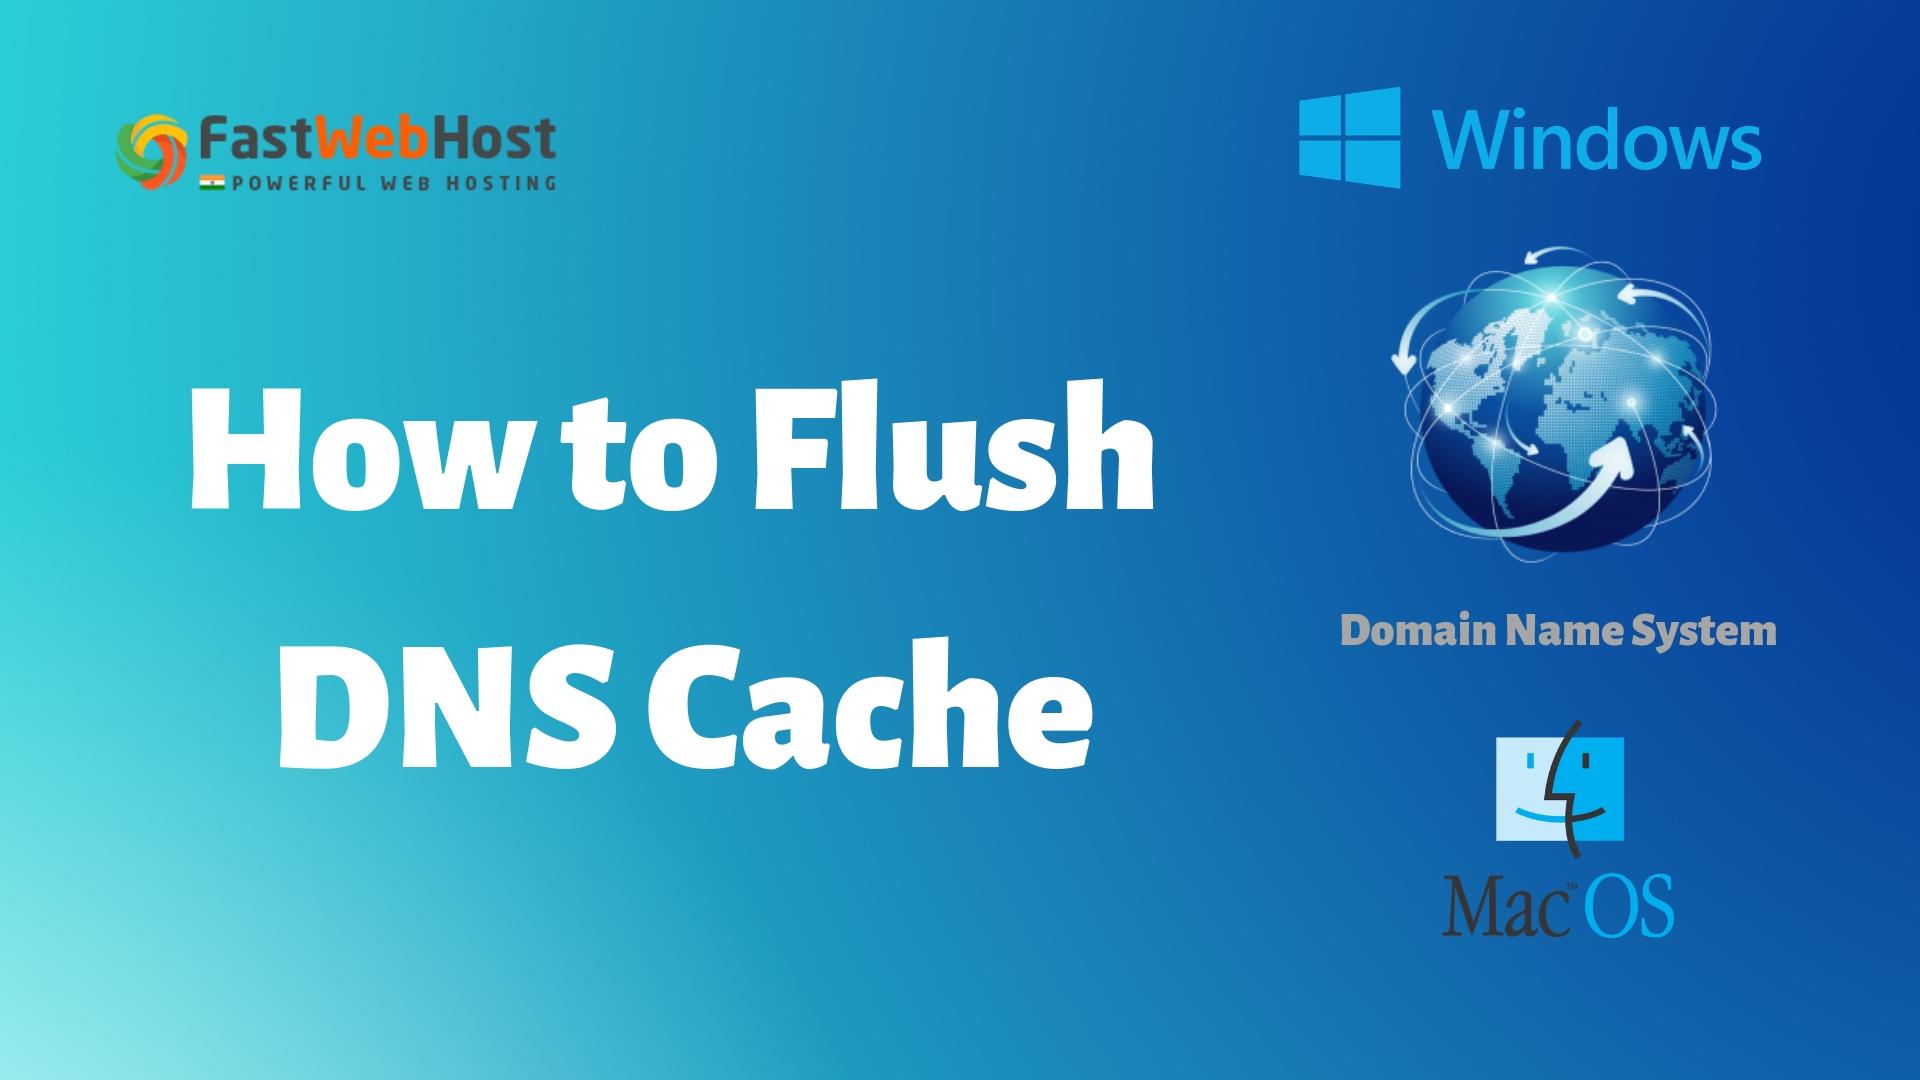 How to Flush DNS Cache